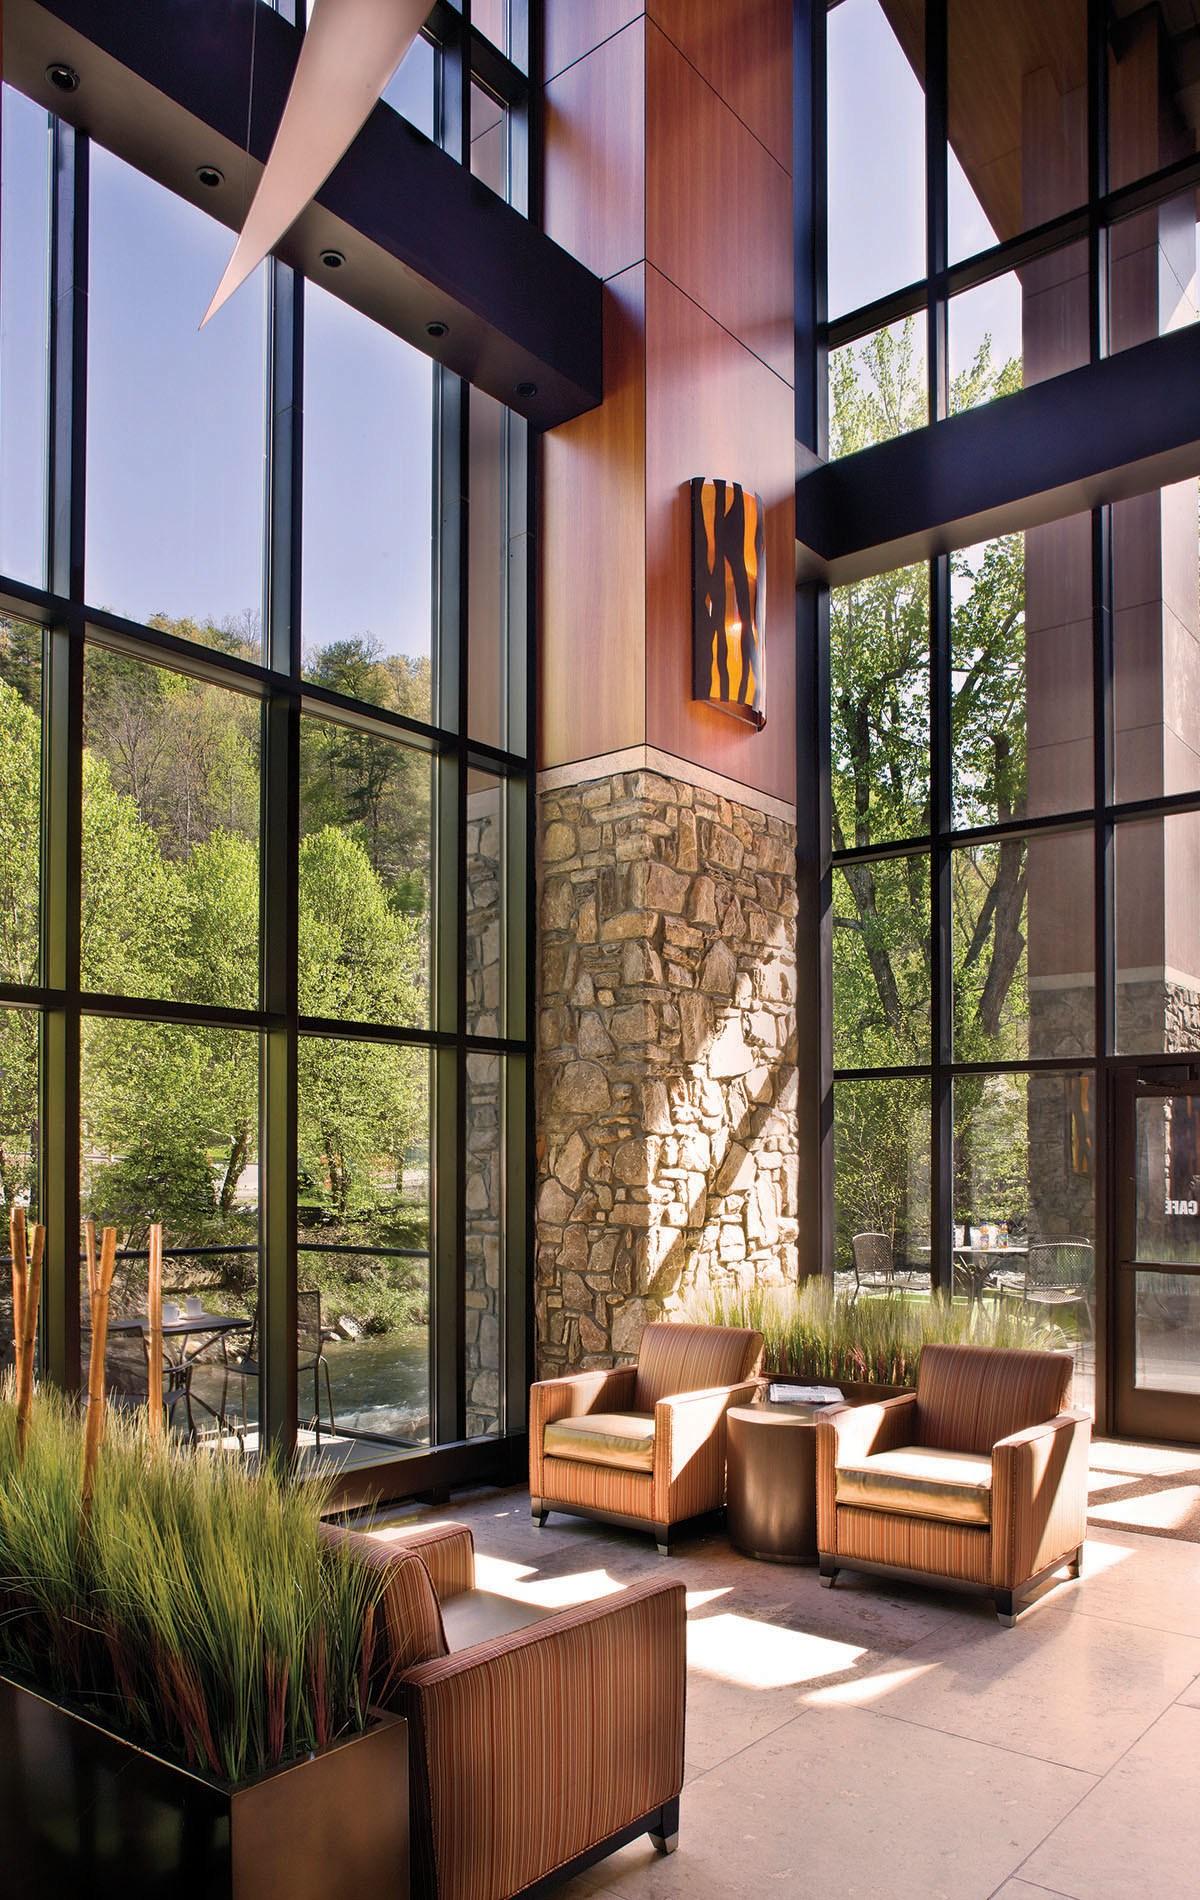 harrahs-cherokee-hotel_153.jpg